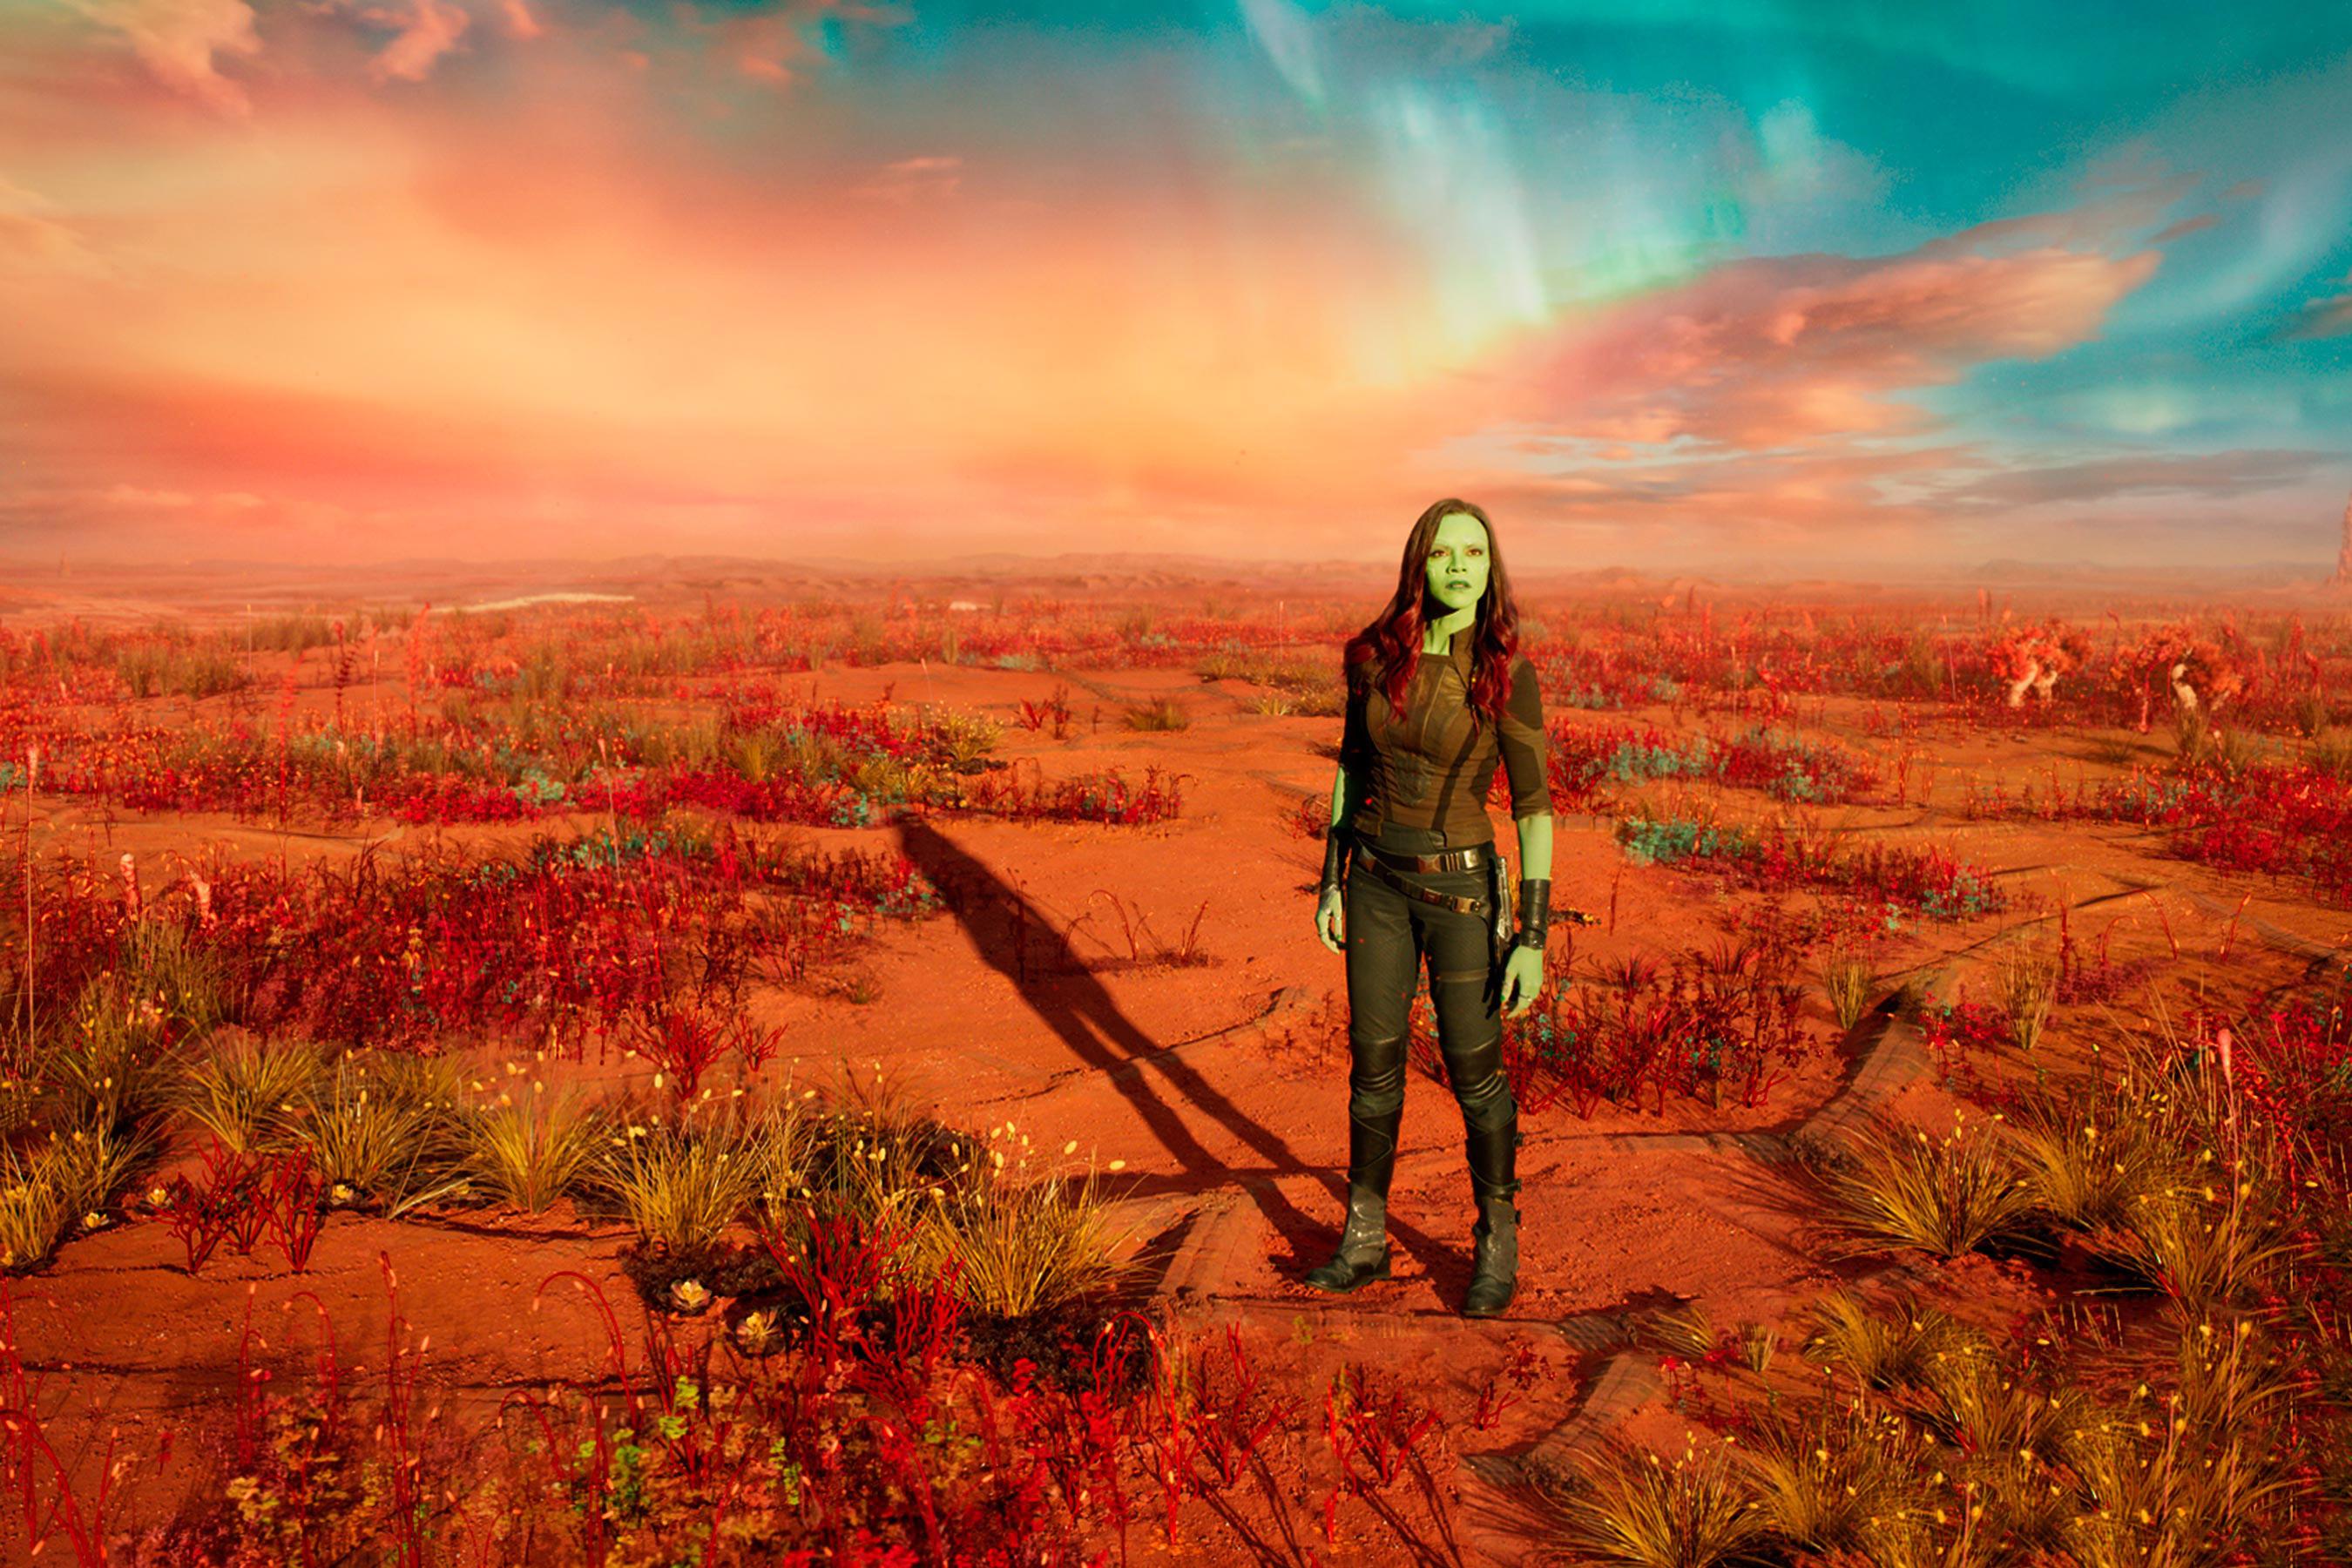 2560x1440 Zoe Saldana As Gamora In Guardians Of Galaxy Vol 2 1440p